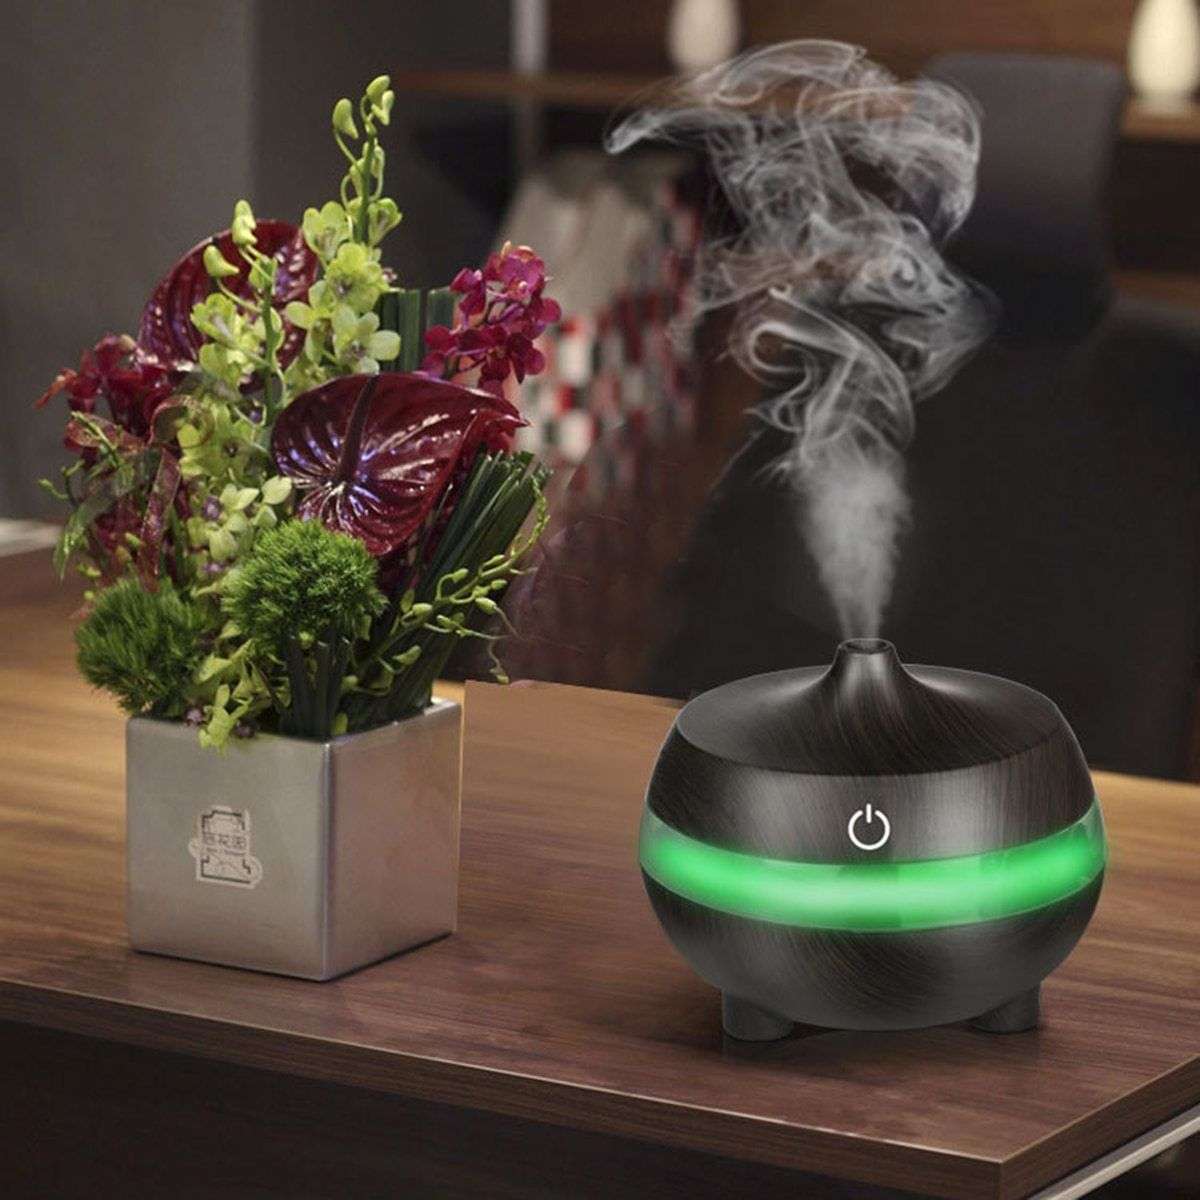 USB Aroma Essential Oil Diffuser Ultrasonic Cool Mist